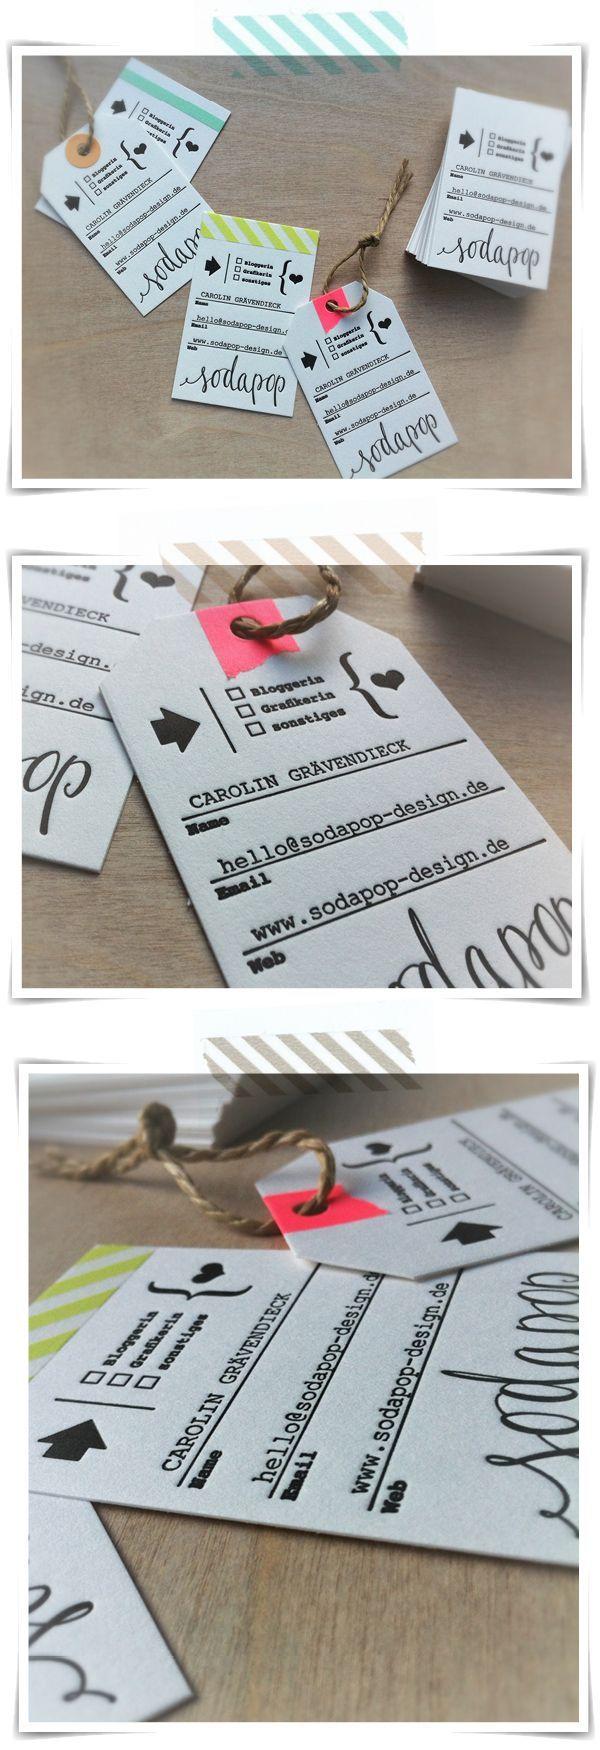 business cards vikings pinterest grafik design visitenkarten und visitenkarten design. Black Bedroom Furniture Sets. Home Design Ideas